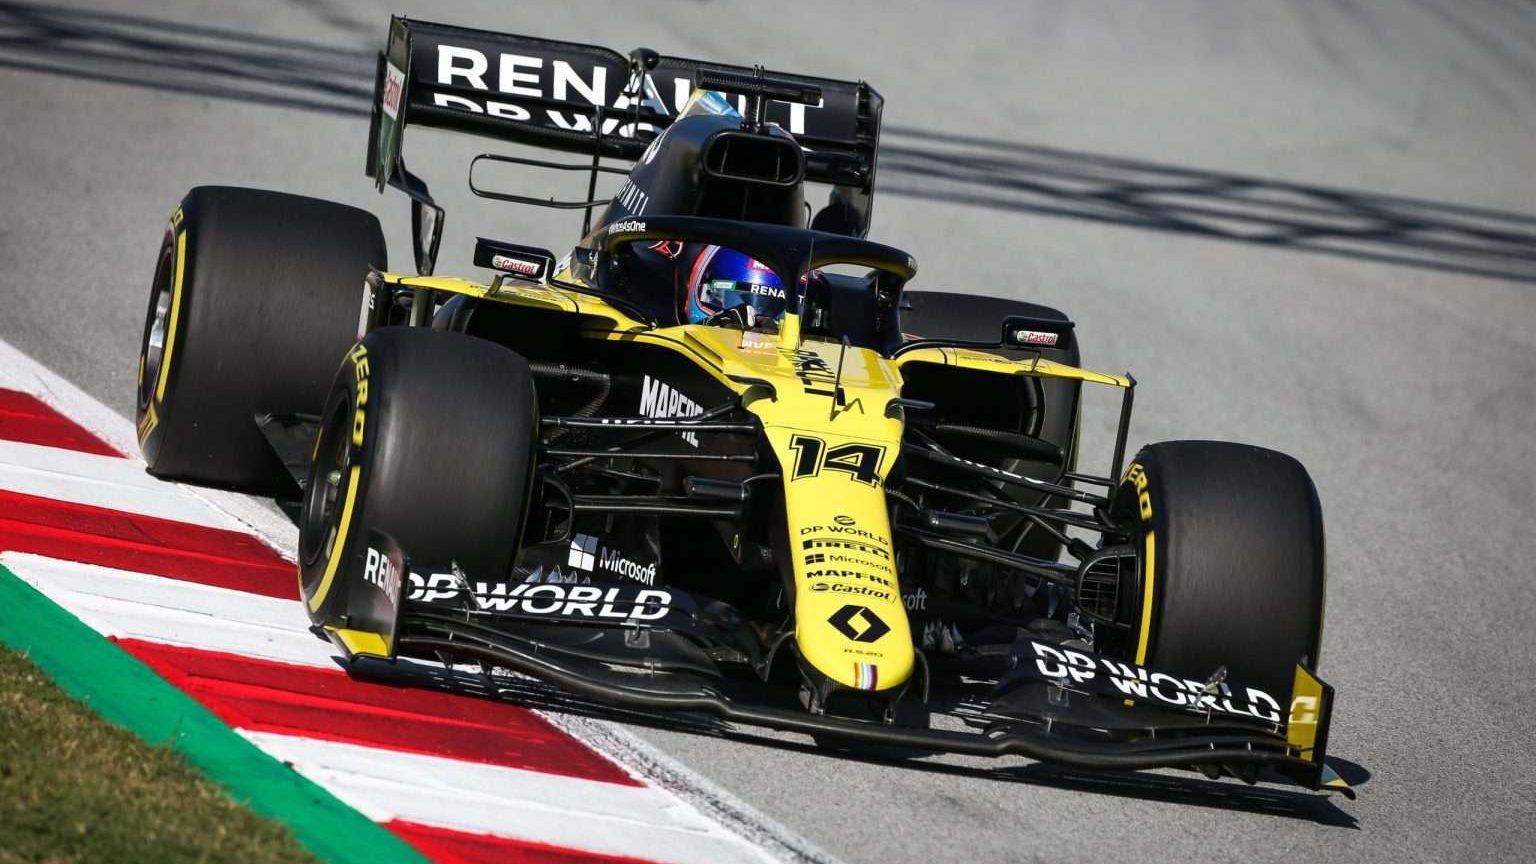 Fernando Alonson Renault 2021